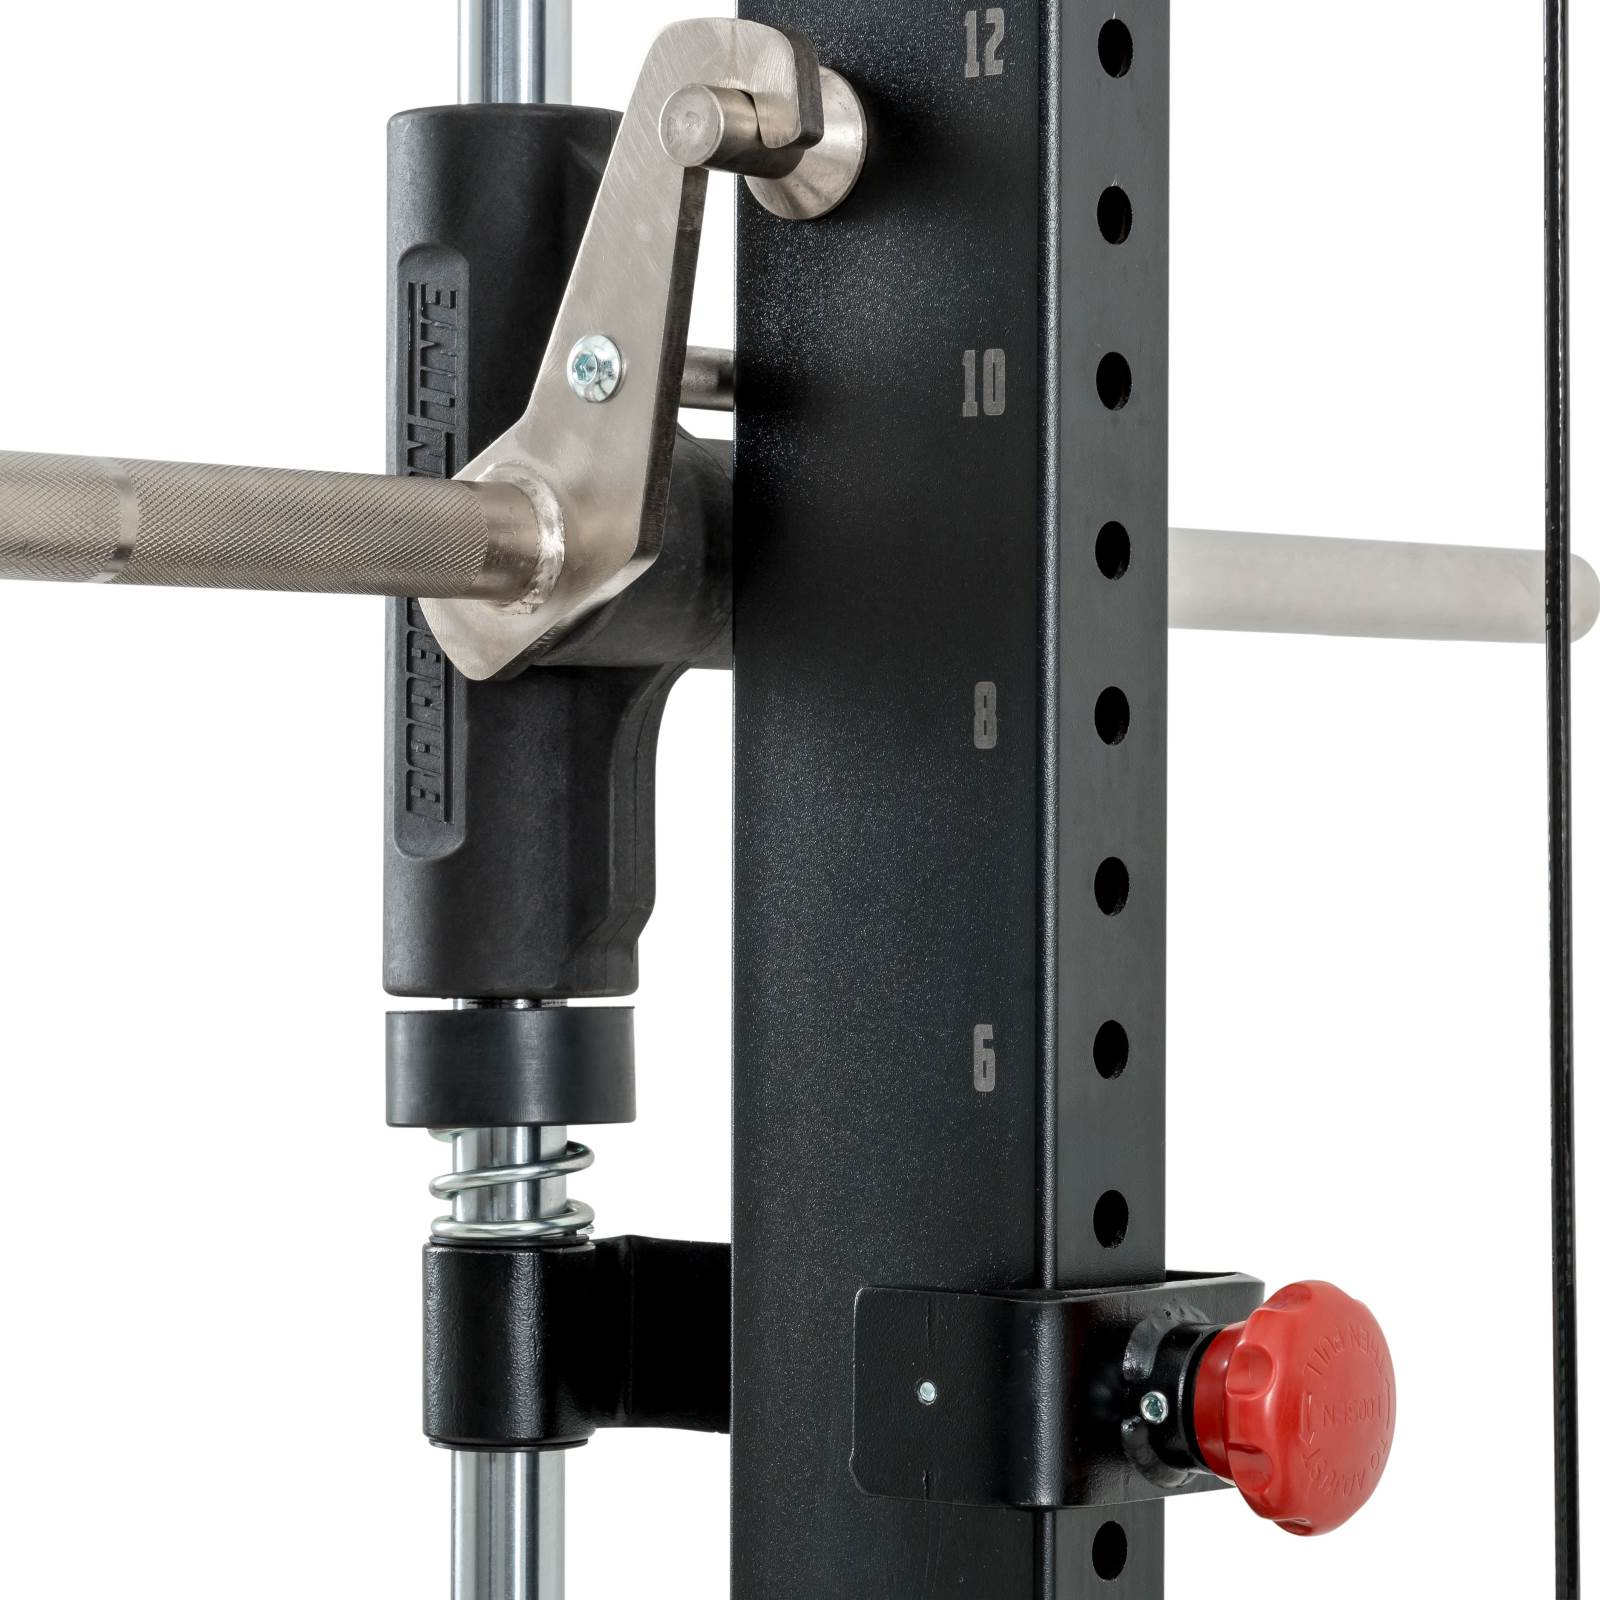 smith machine spotter system